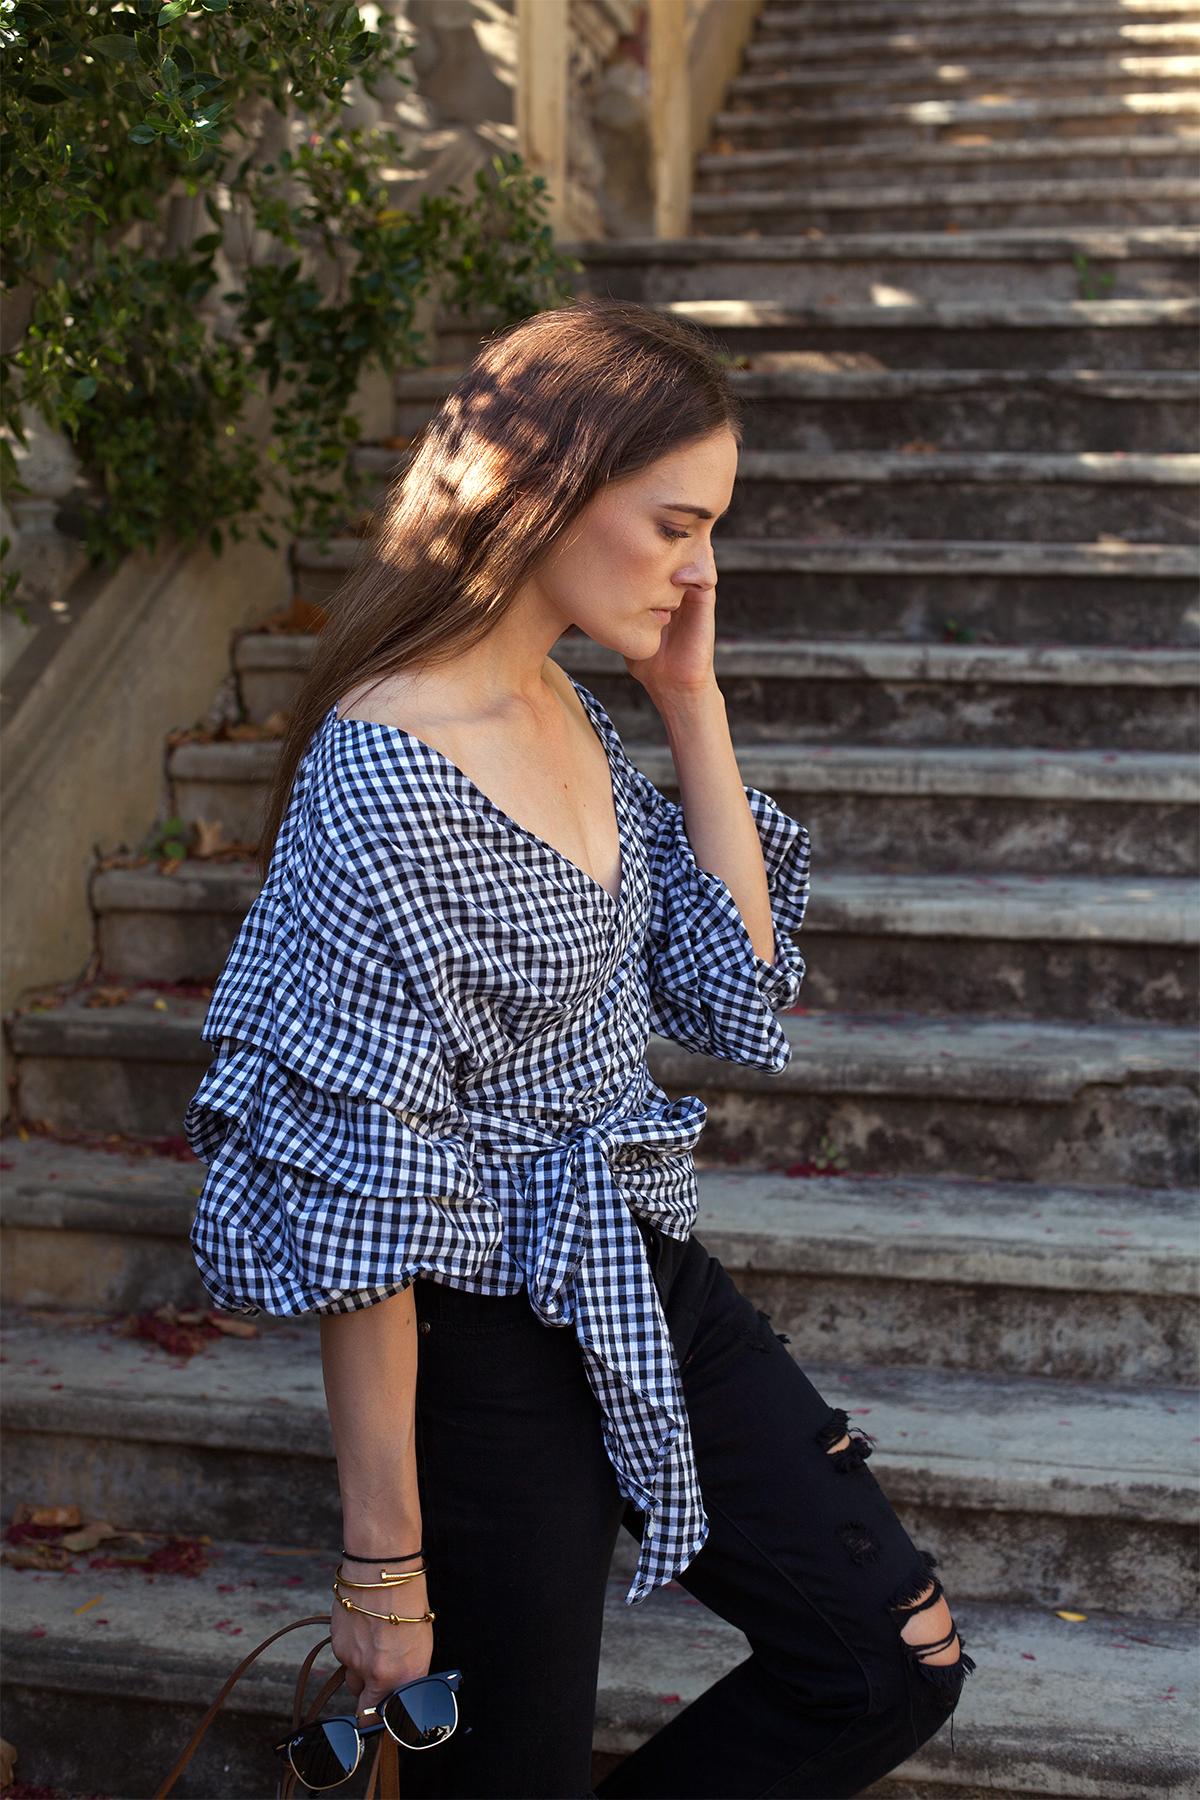 gingham top inspiring wit Australian fashion blogger